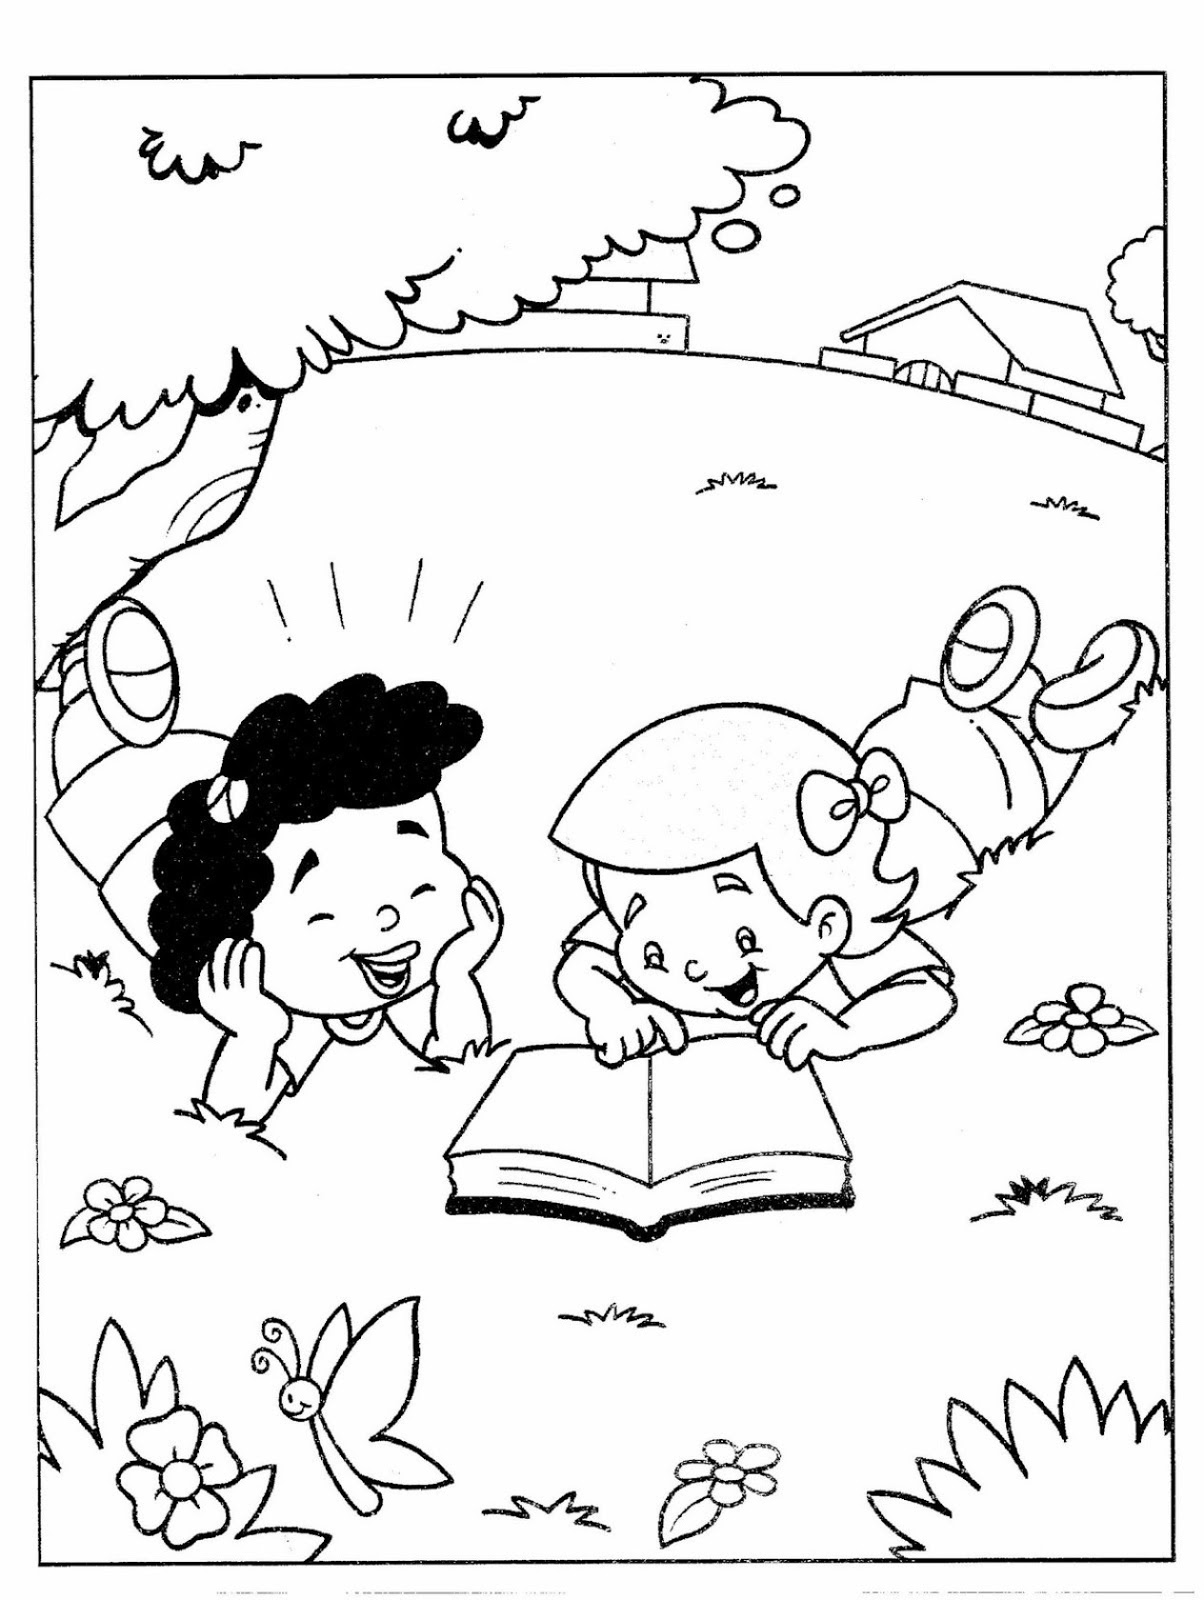 Dibujos Animados De Ninos Leyendo La Biblia Dibujos Animados